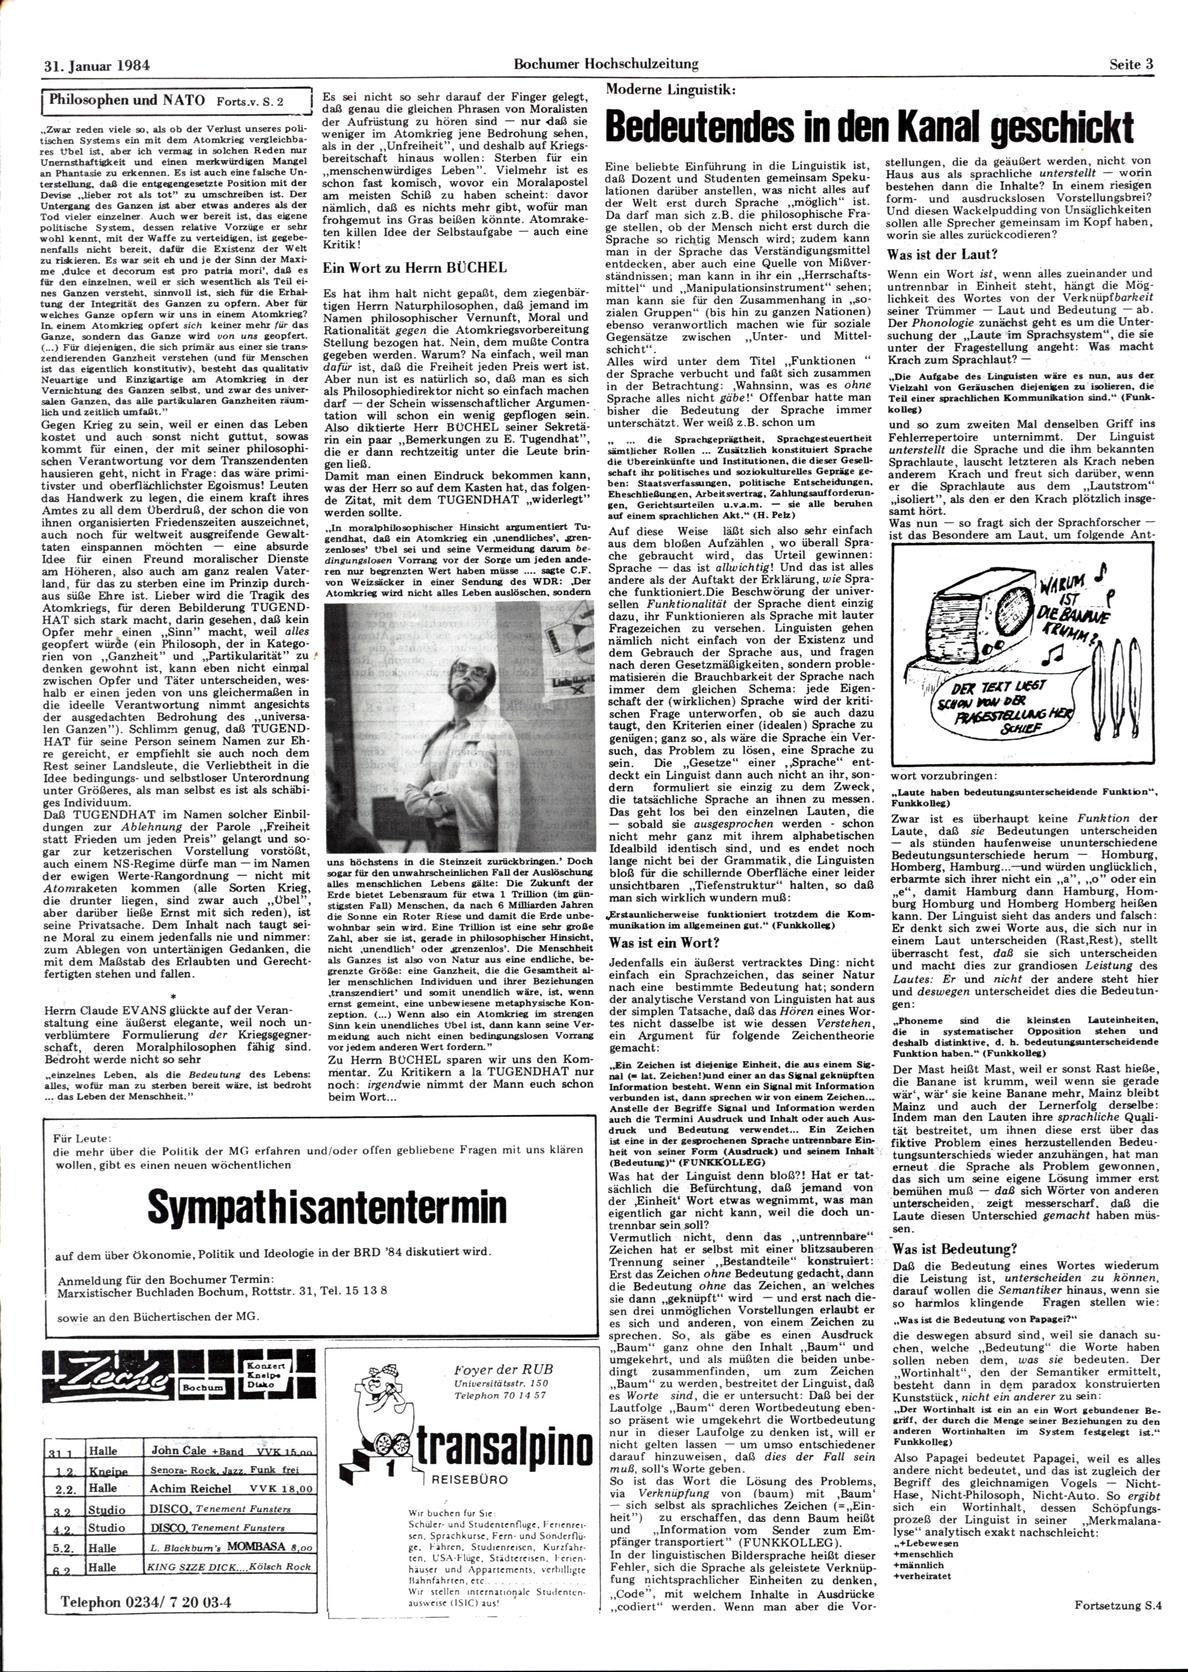 Bochum_BHZ_19840131_086_003